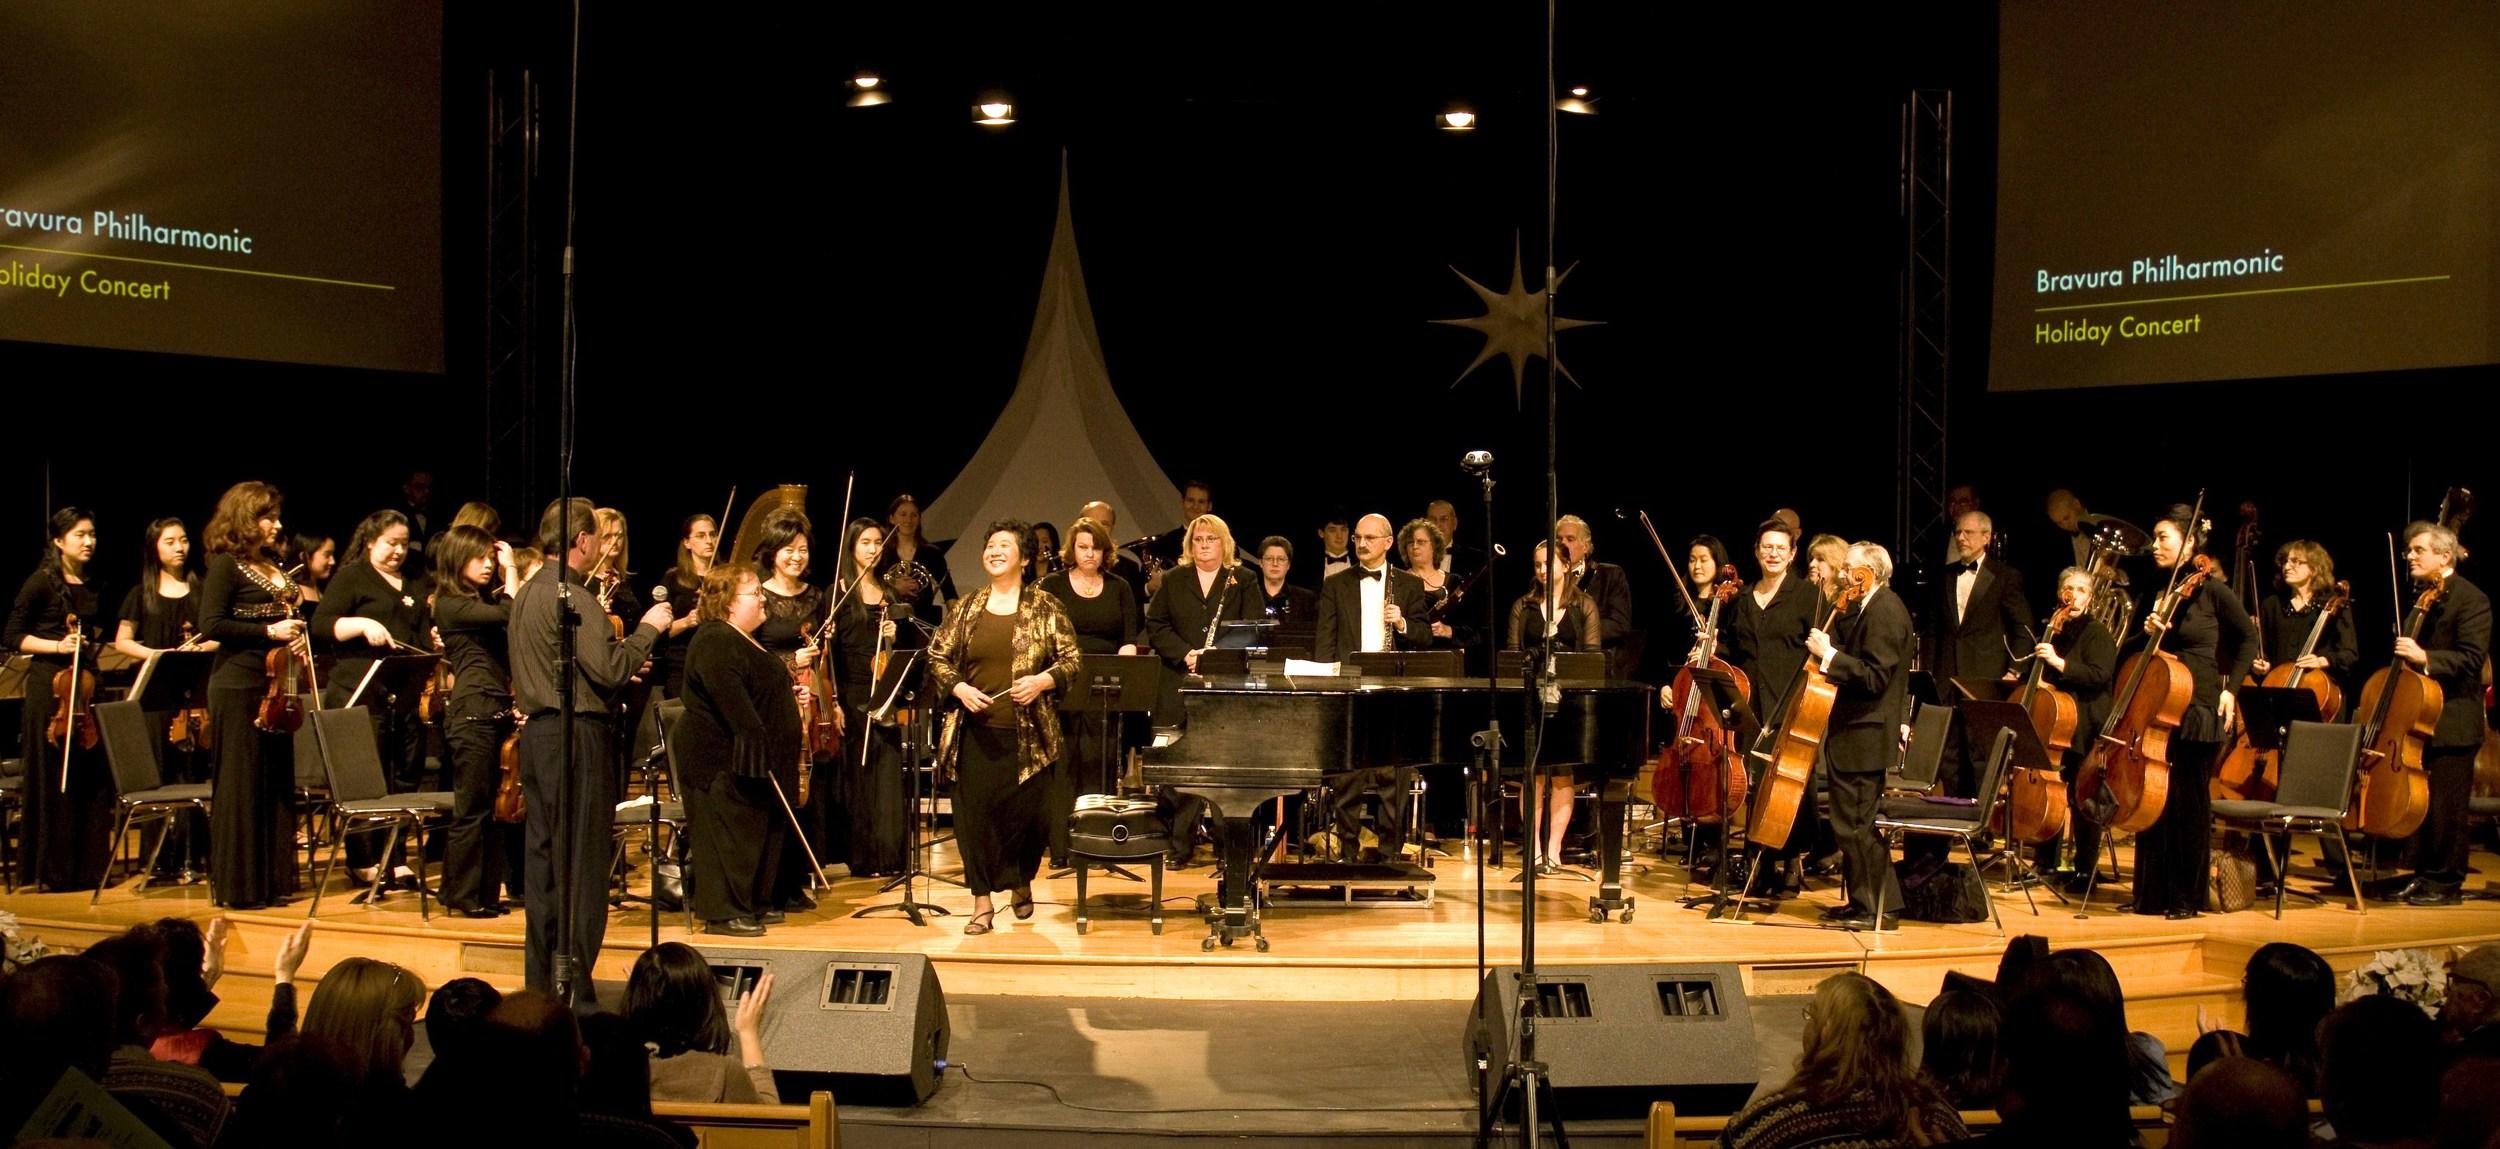 Bravura Philharmonic takes center stage